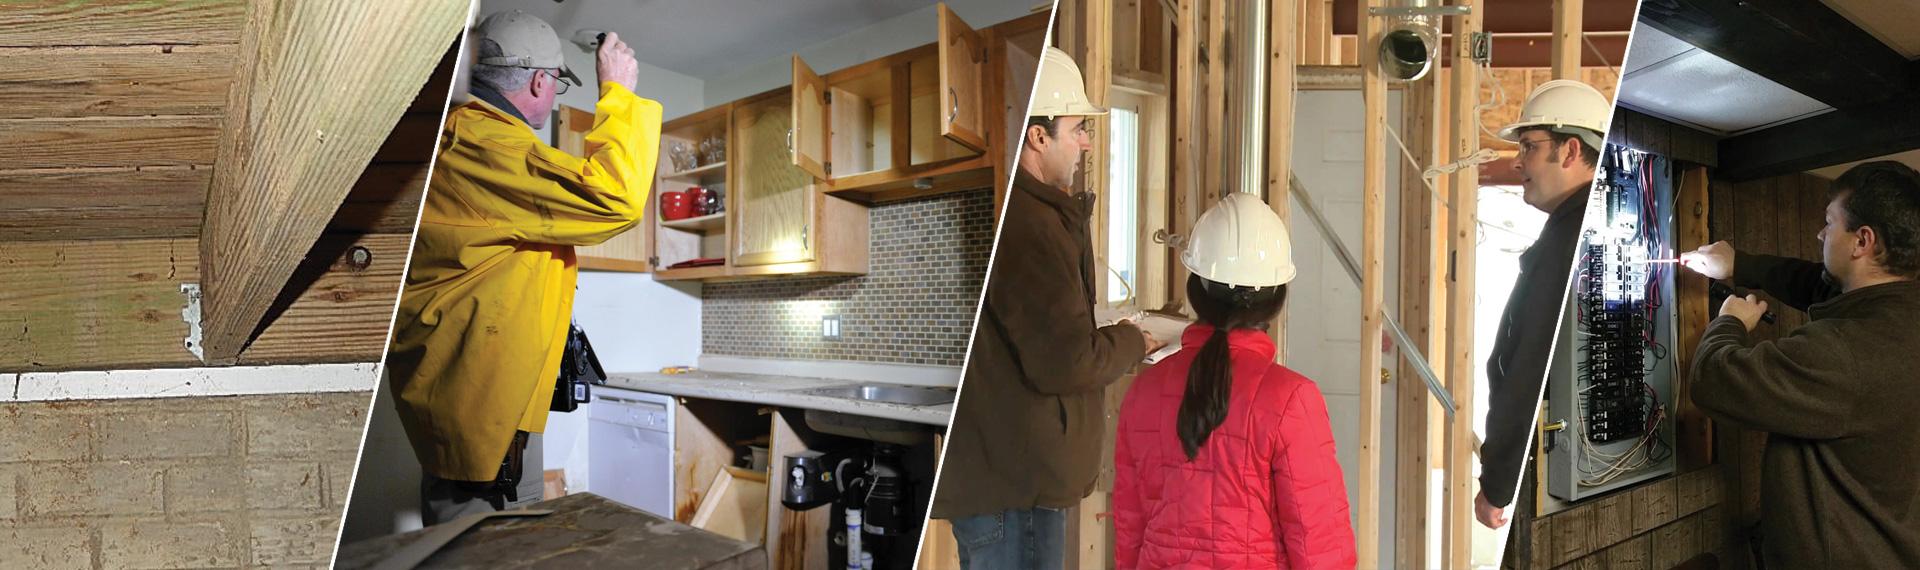 Intel Home Inspections Fairfax VA